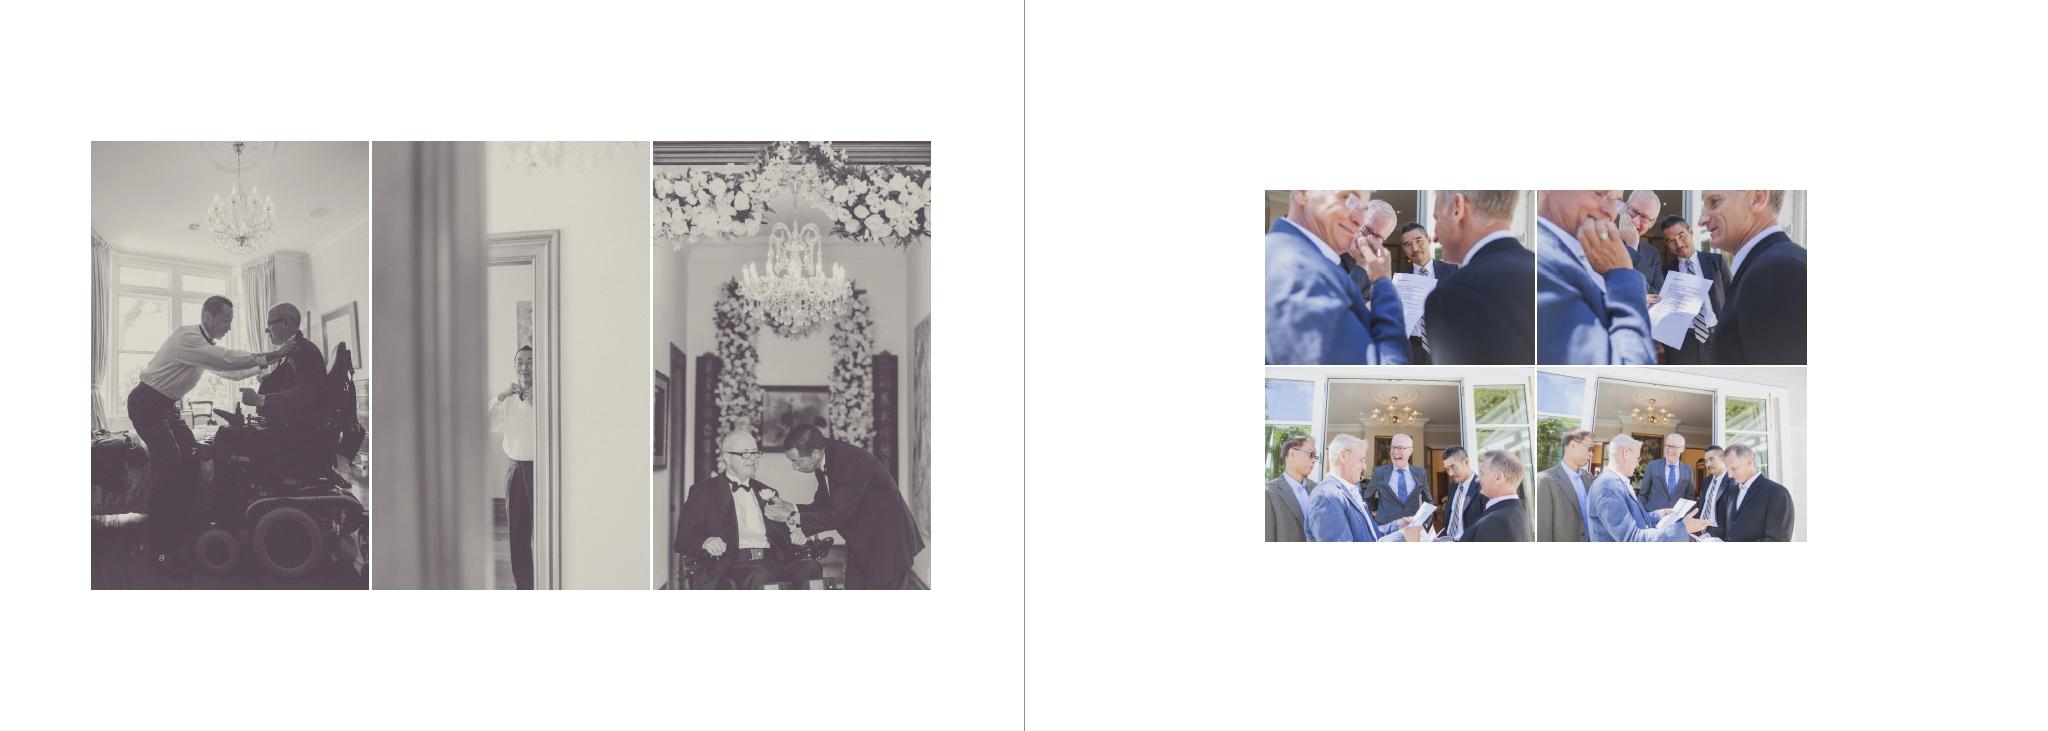 Wedding album layout design by Jenny Siaosi, Wellington wedding photographer.